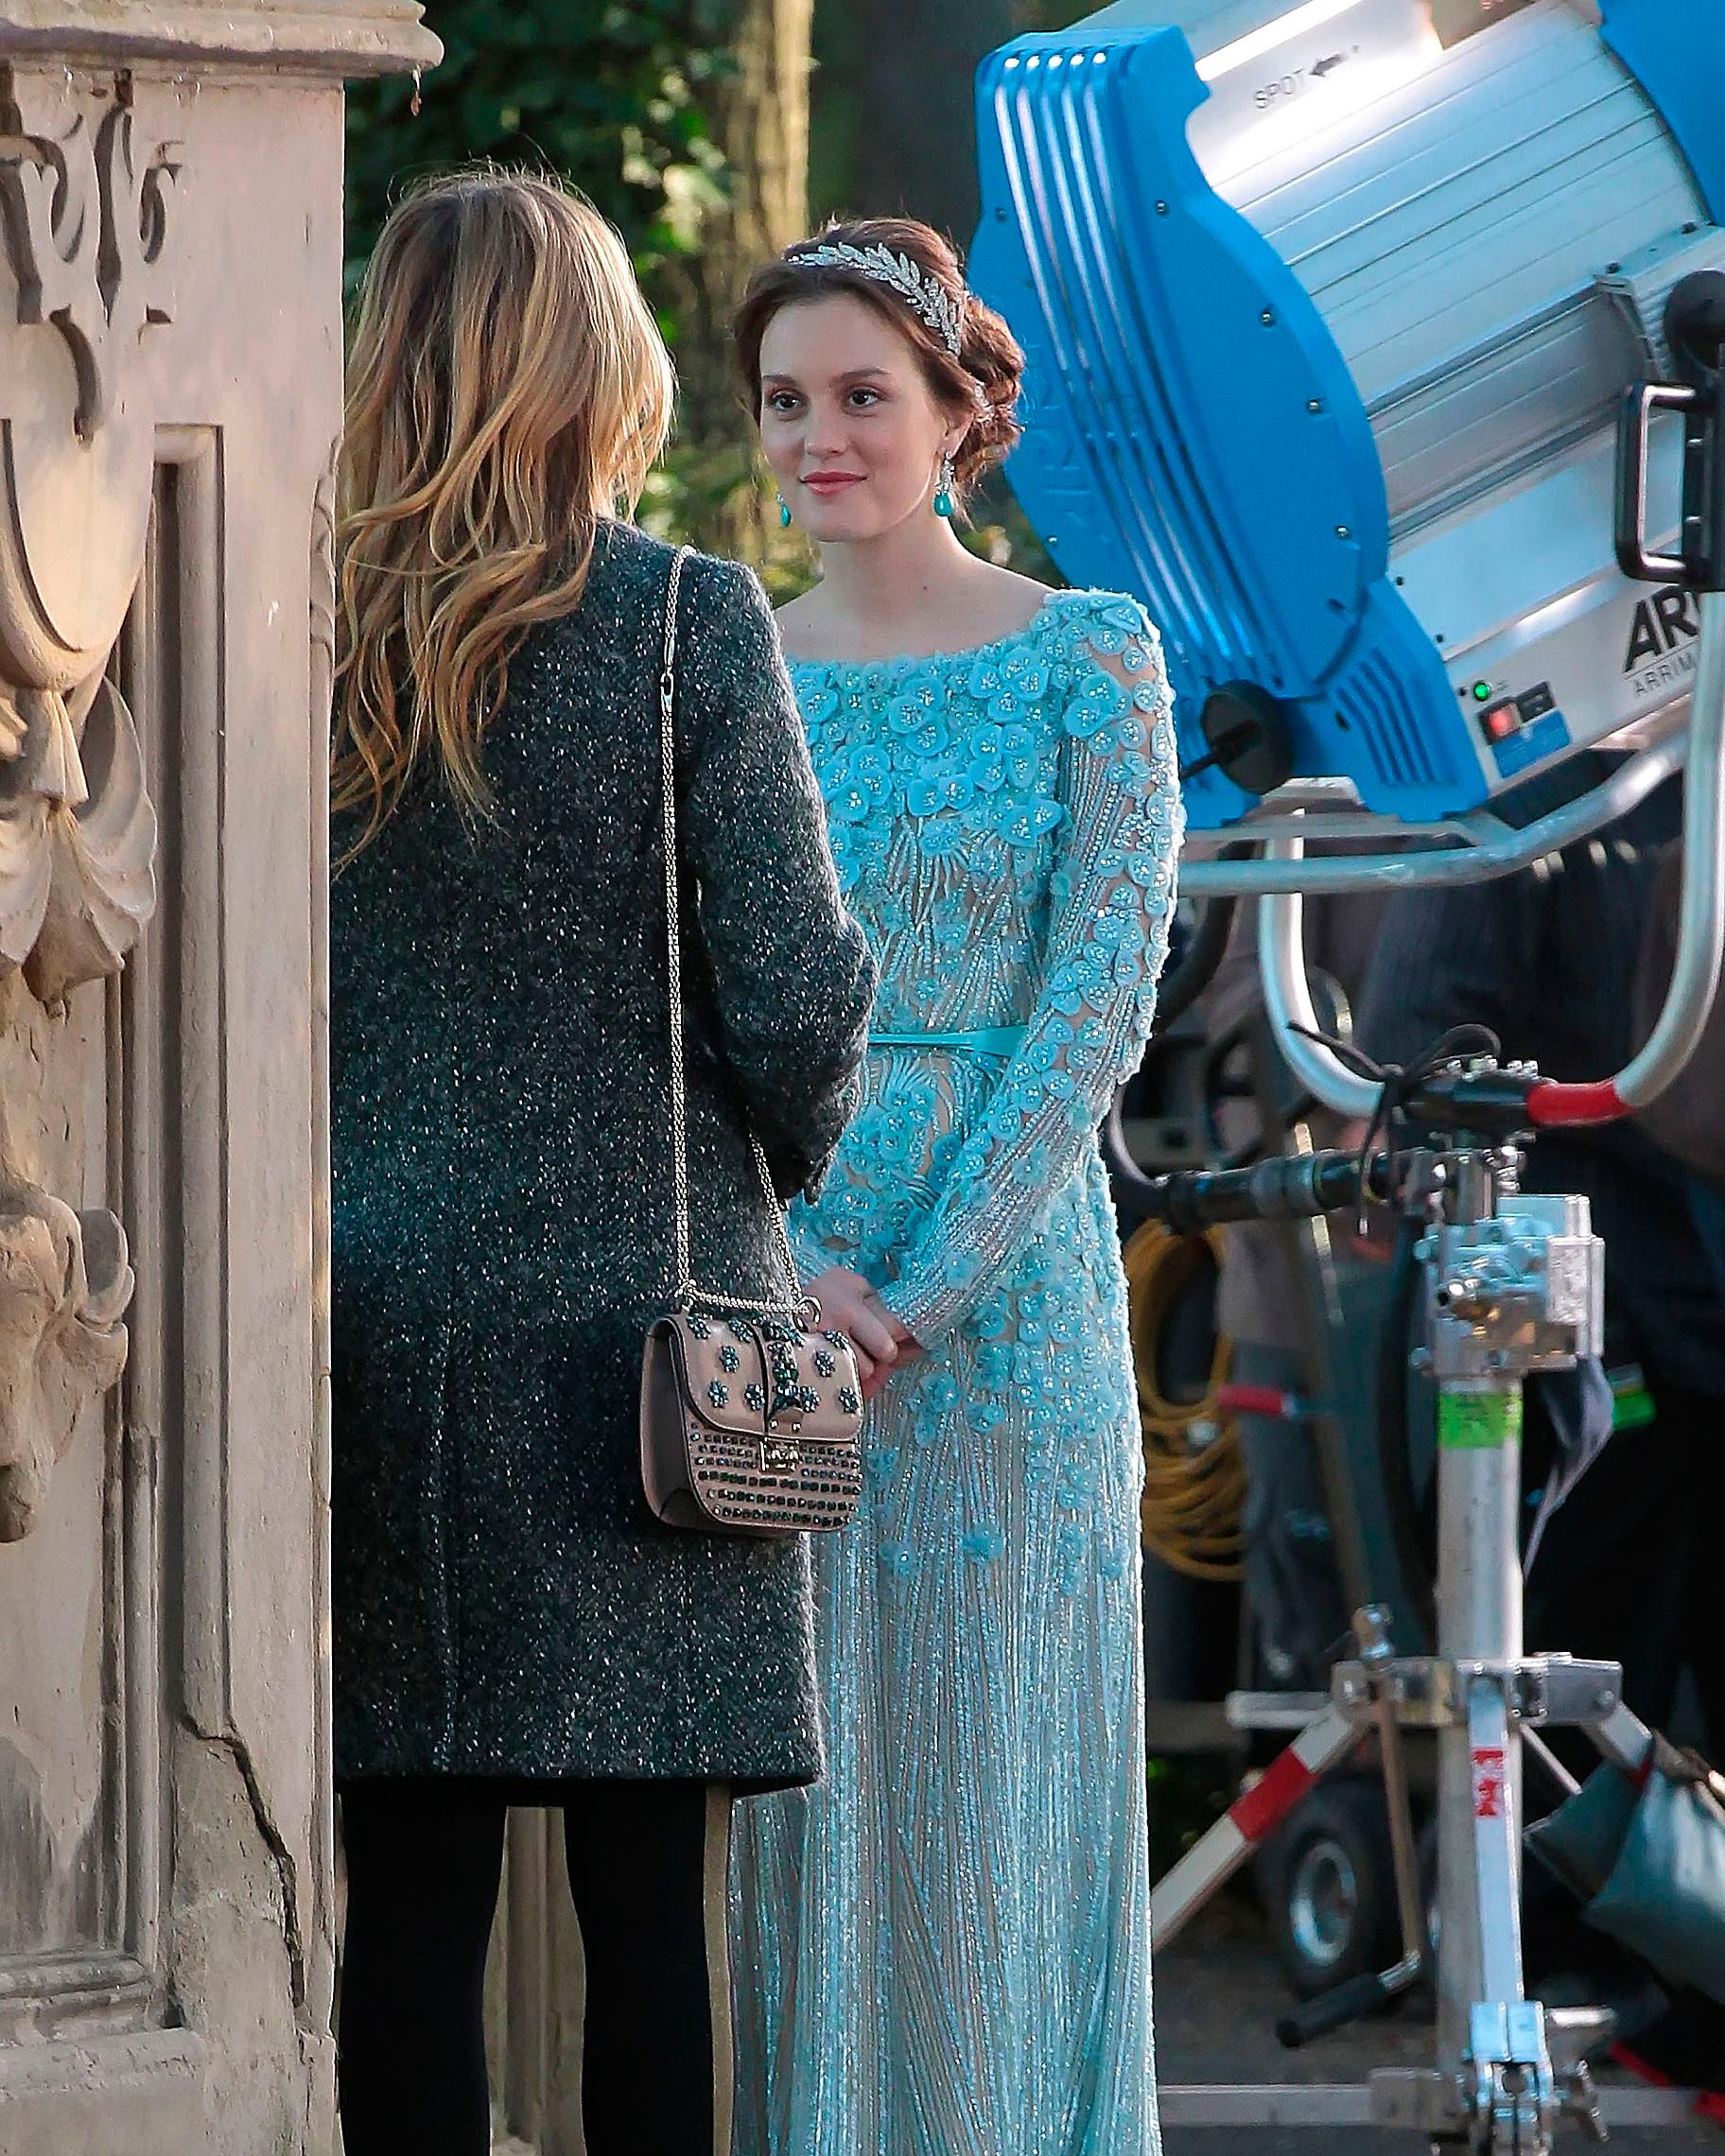 tv-wedding-dresses-gossip-girl-blair-1115.jpg